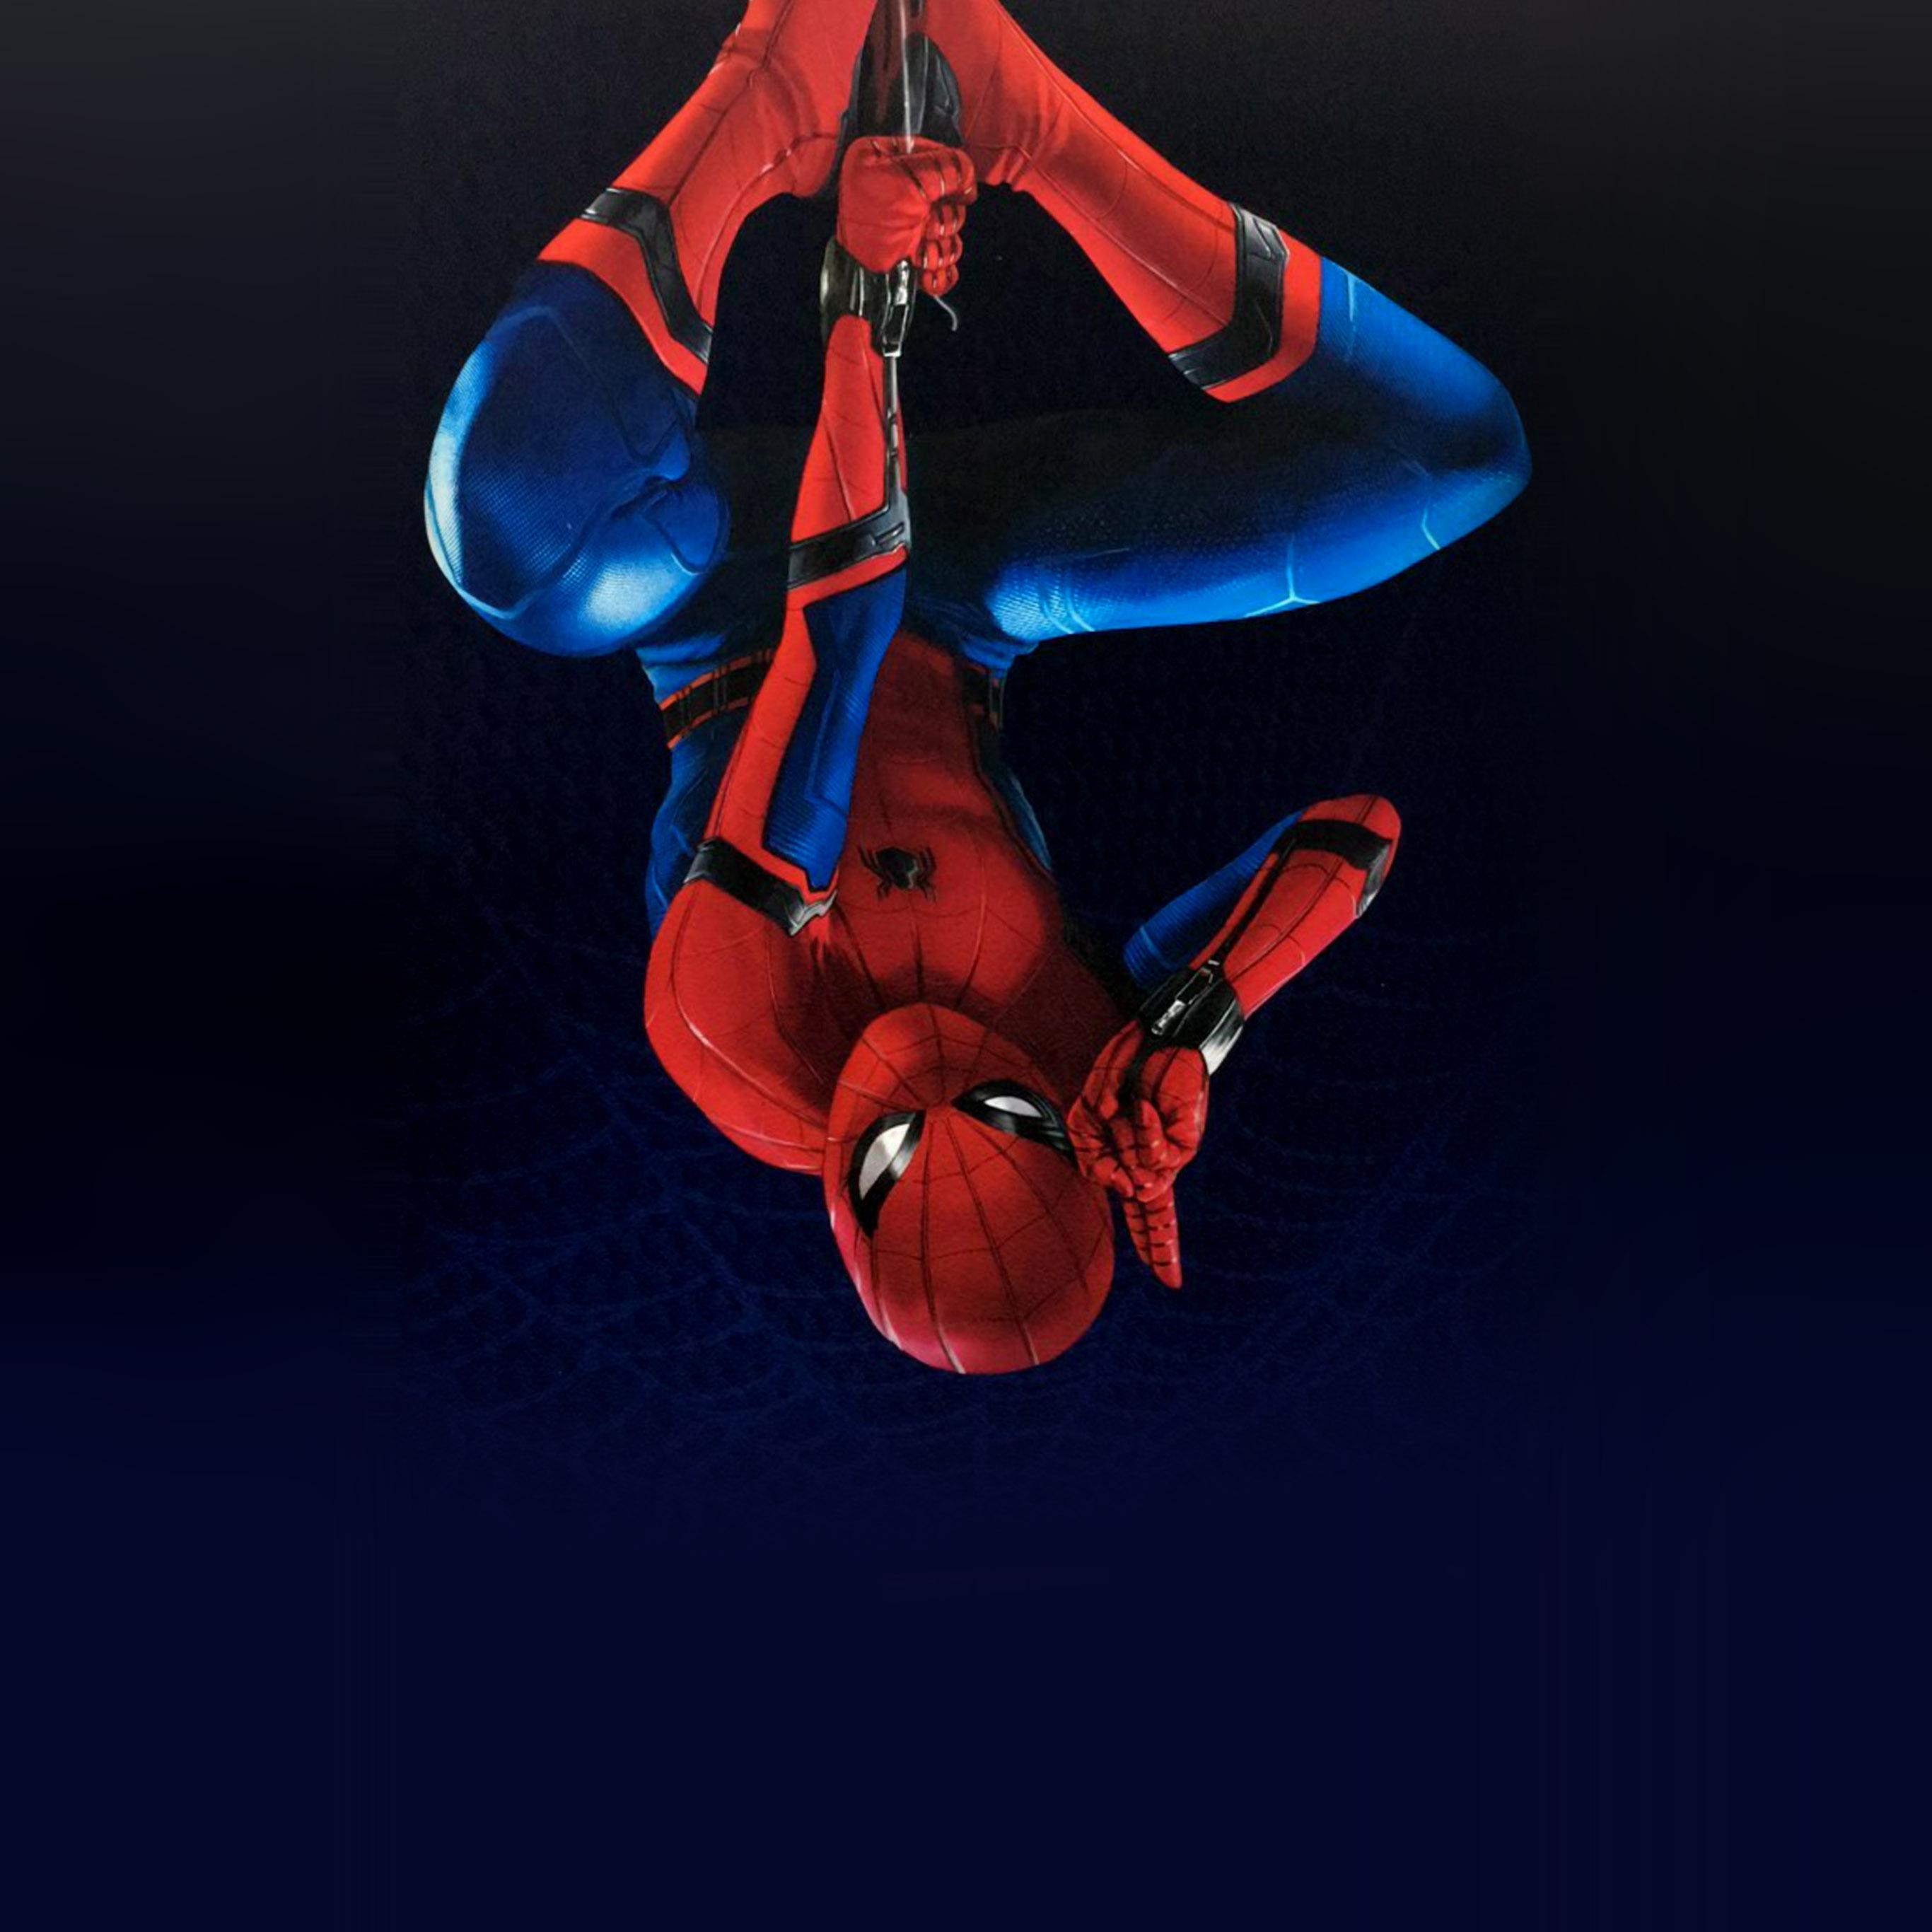 Az61 Spiderman Homecoming Hero Film Illustration Art Wallpaper